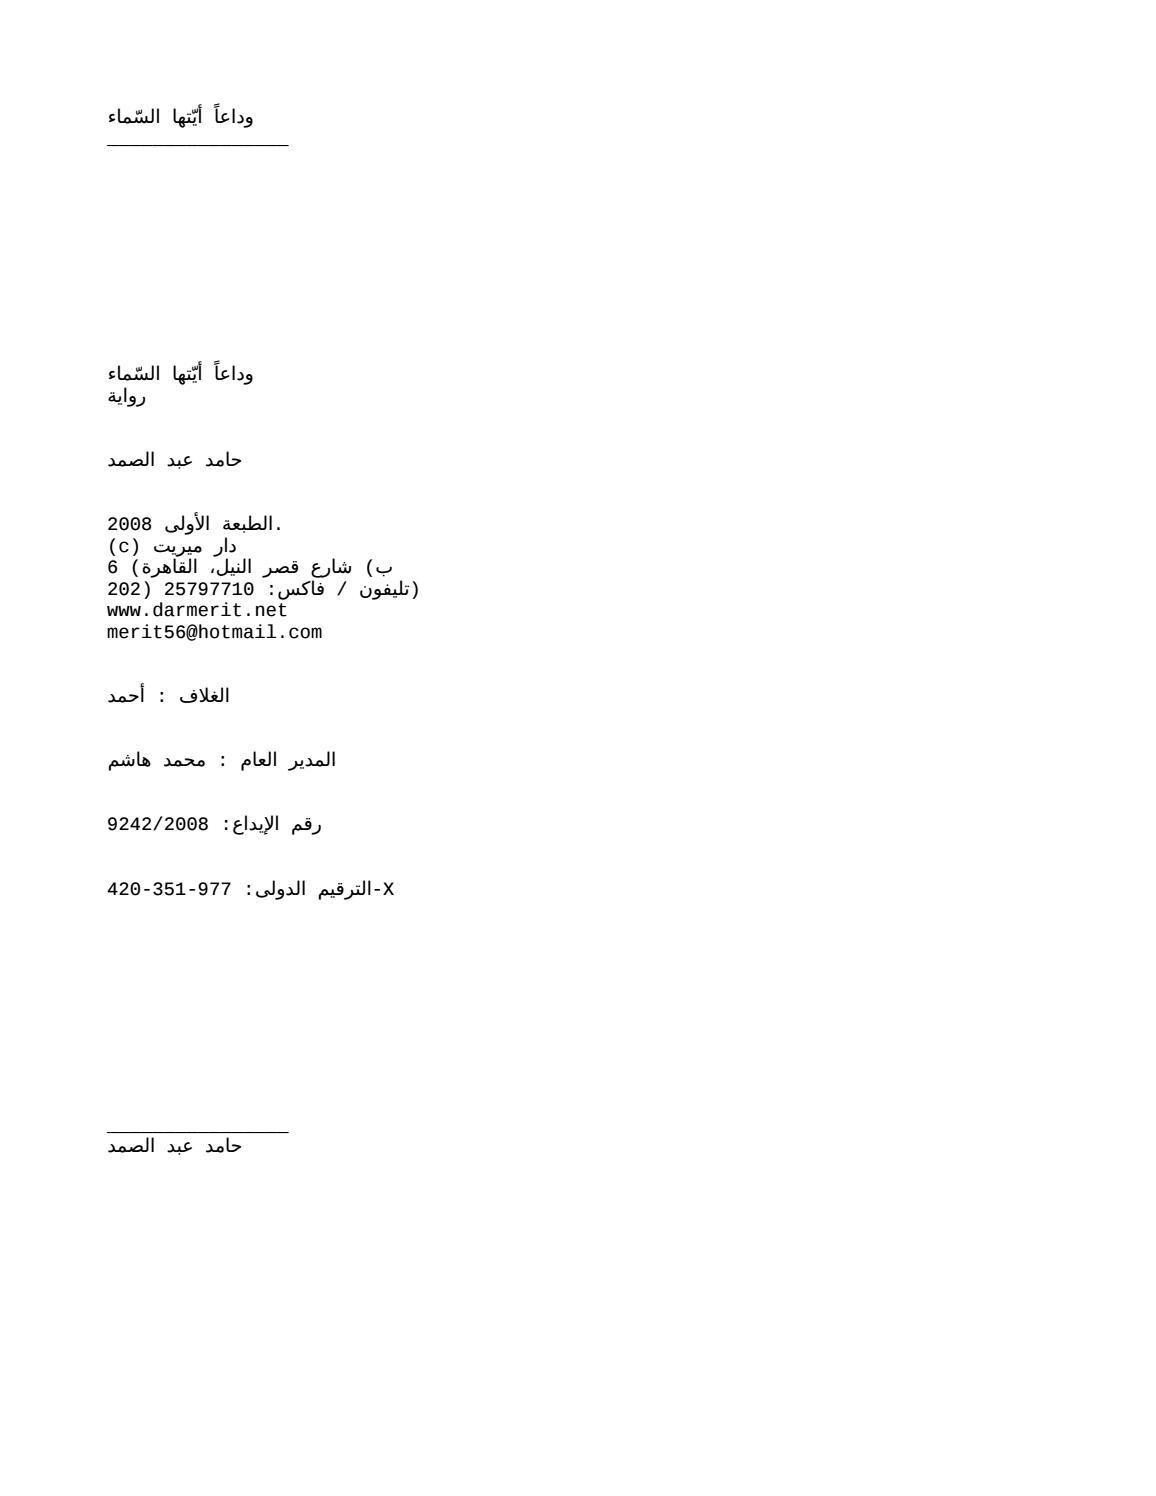 07e09326b70c2 وداعا أيتها السماء by أصدقاء القراءة - همام قباني - issuu